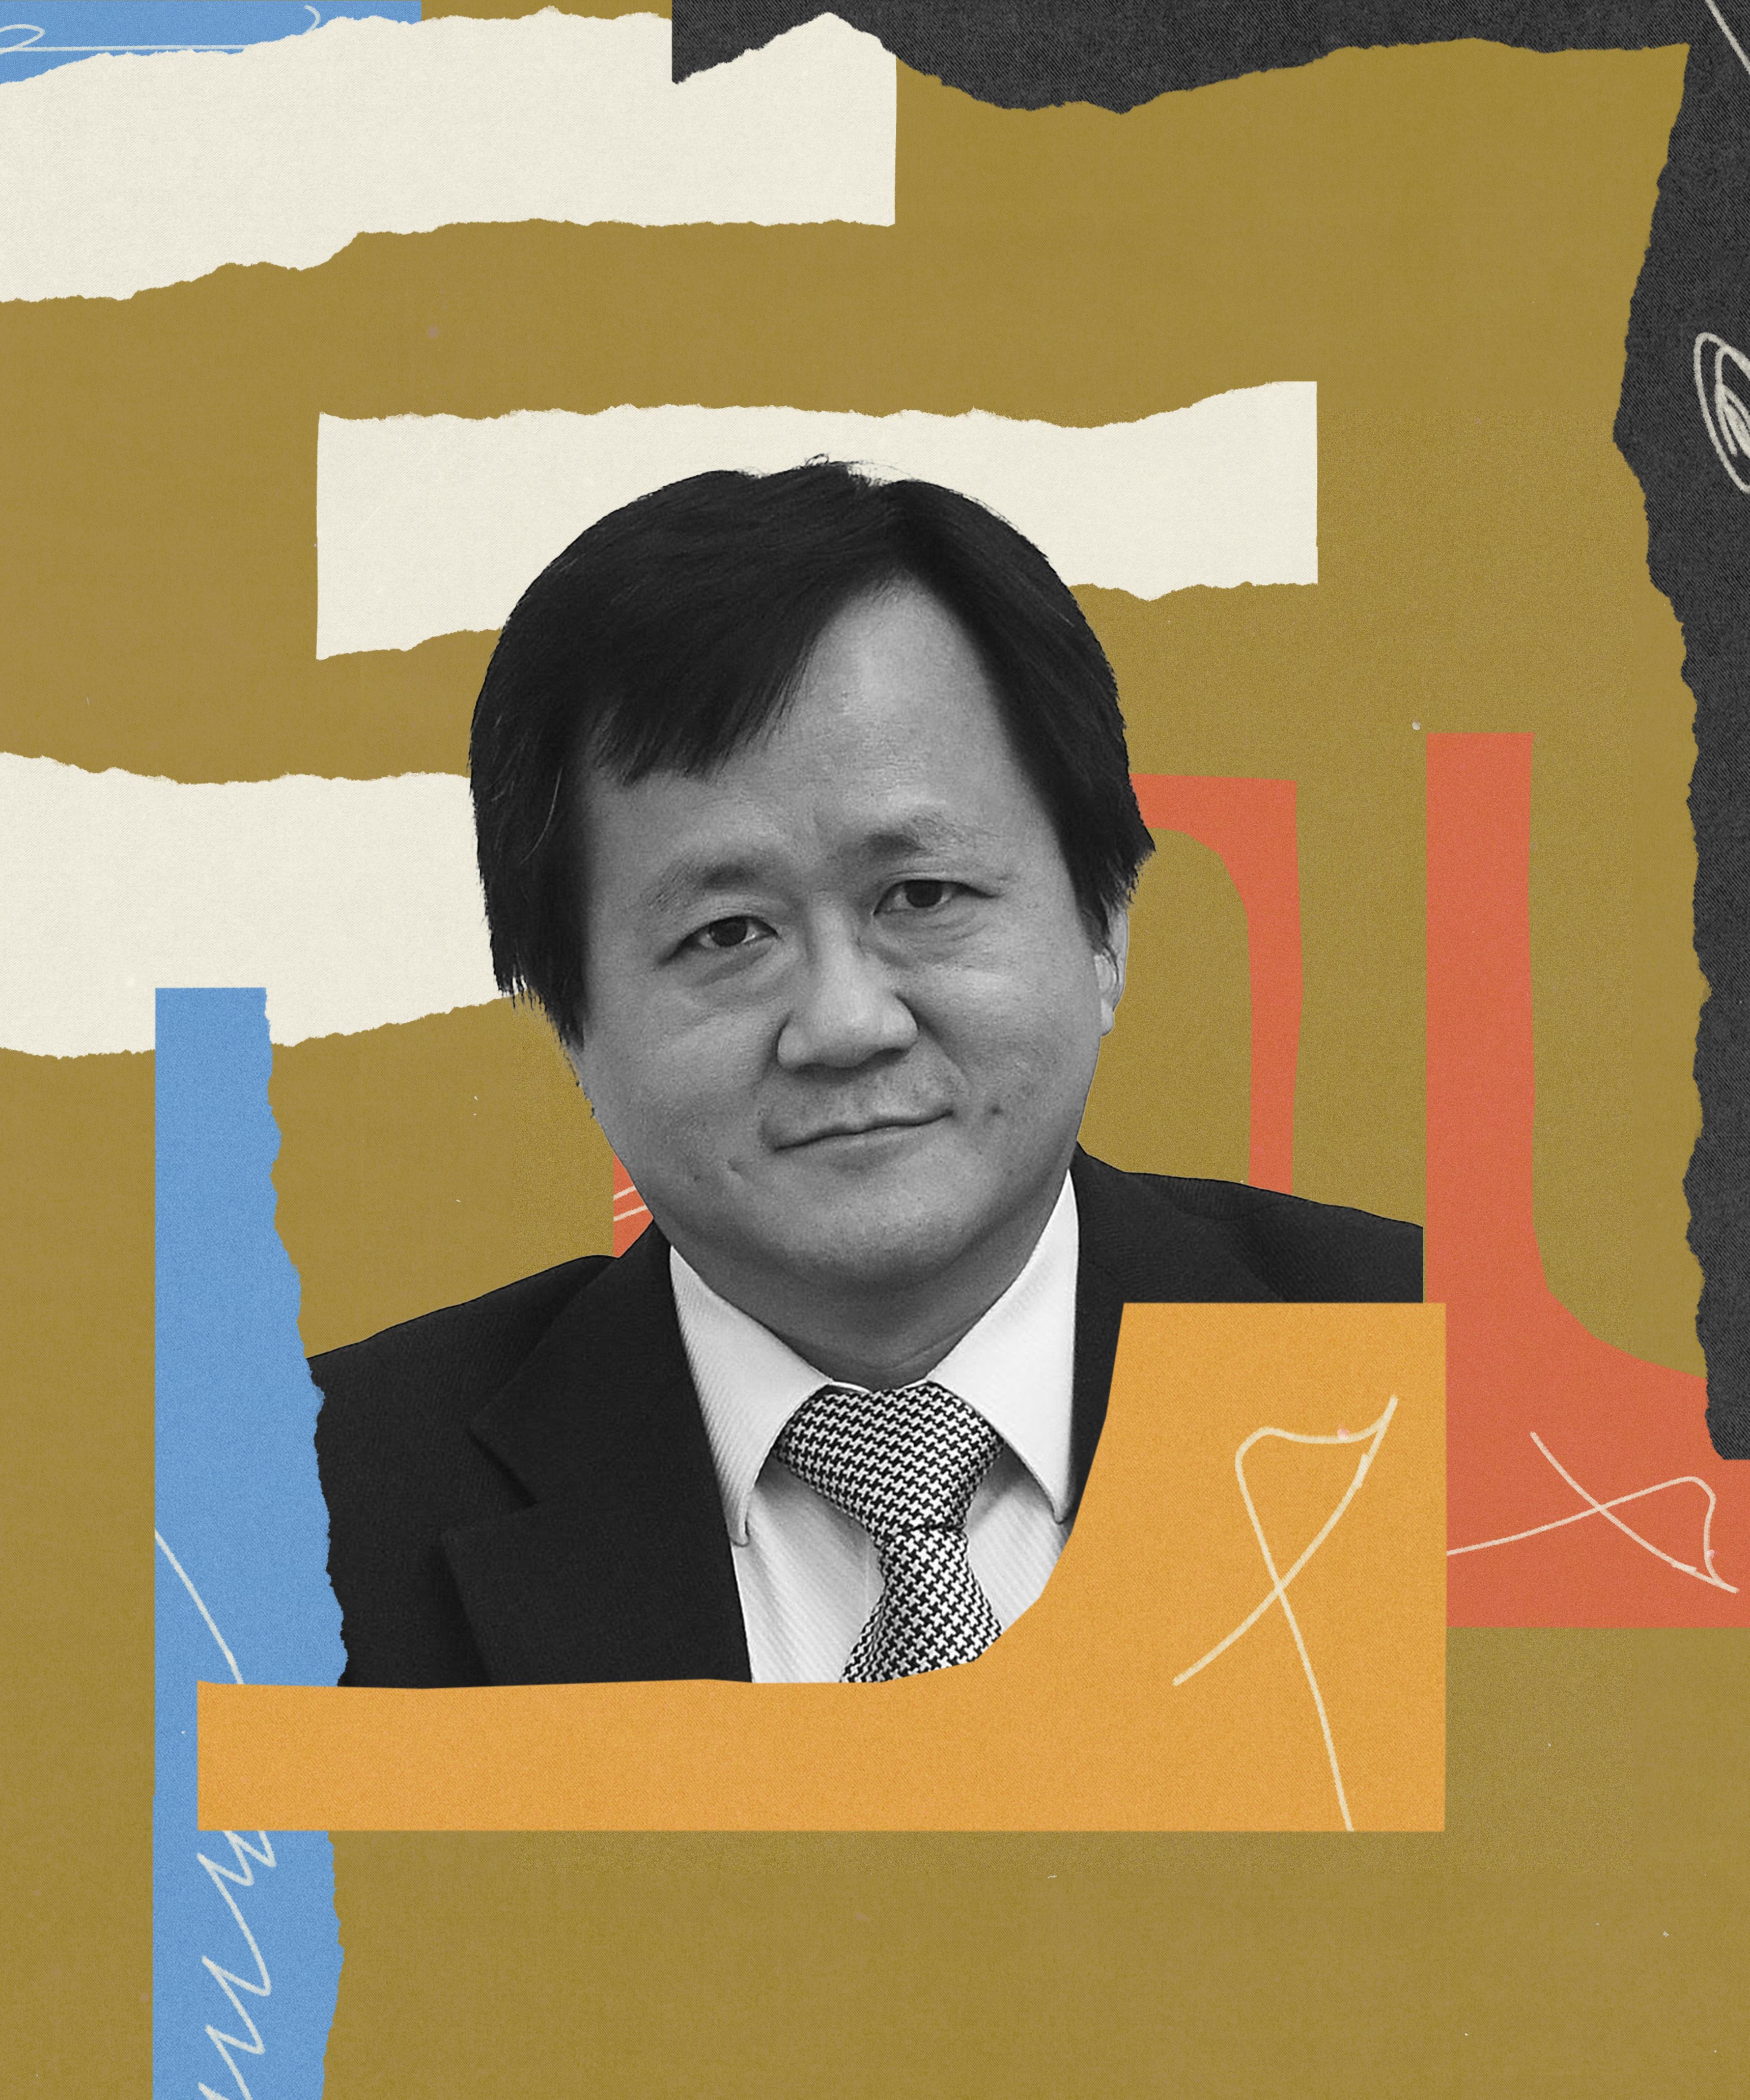 Abstract photo illustration of Steve Tsang